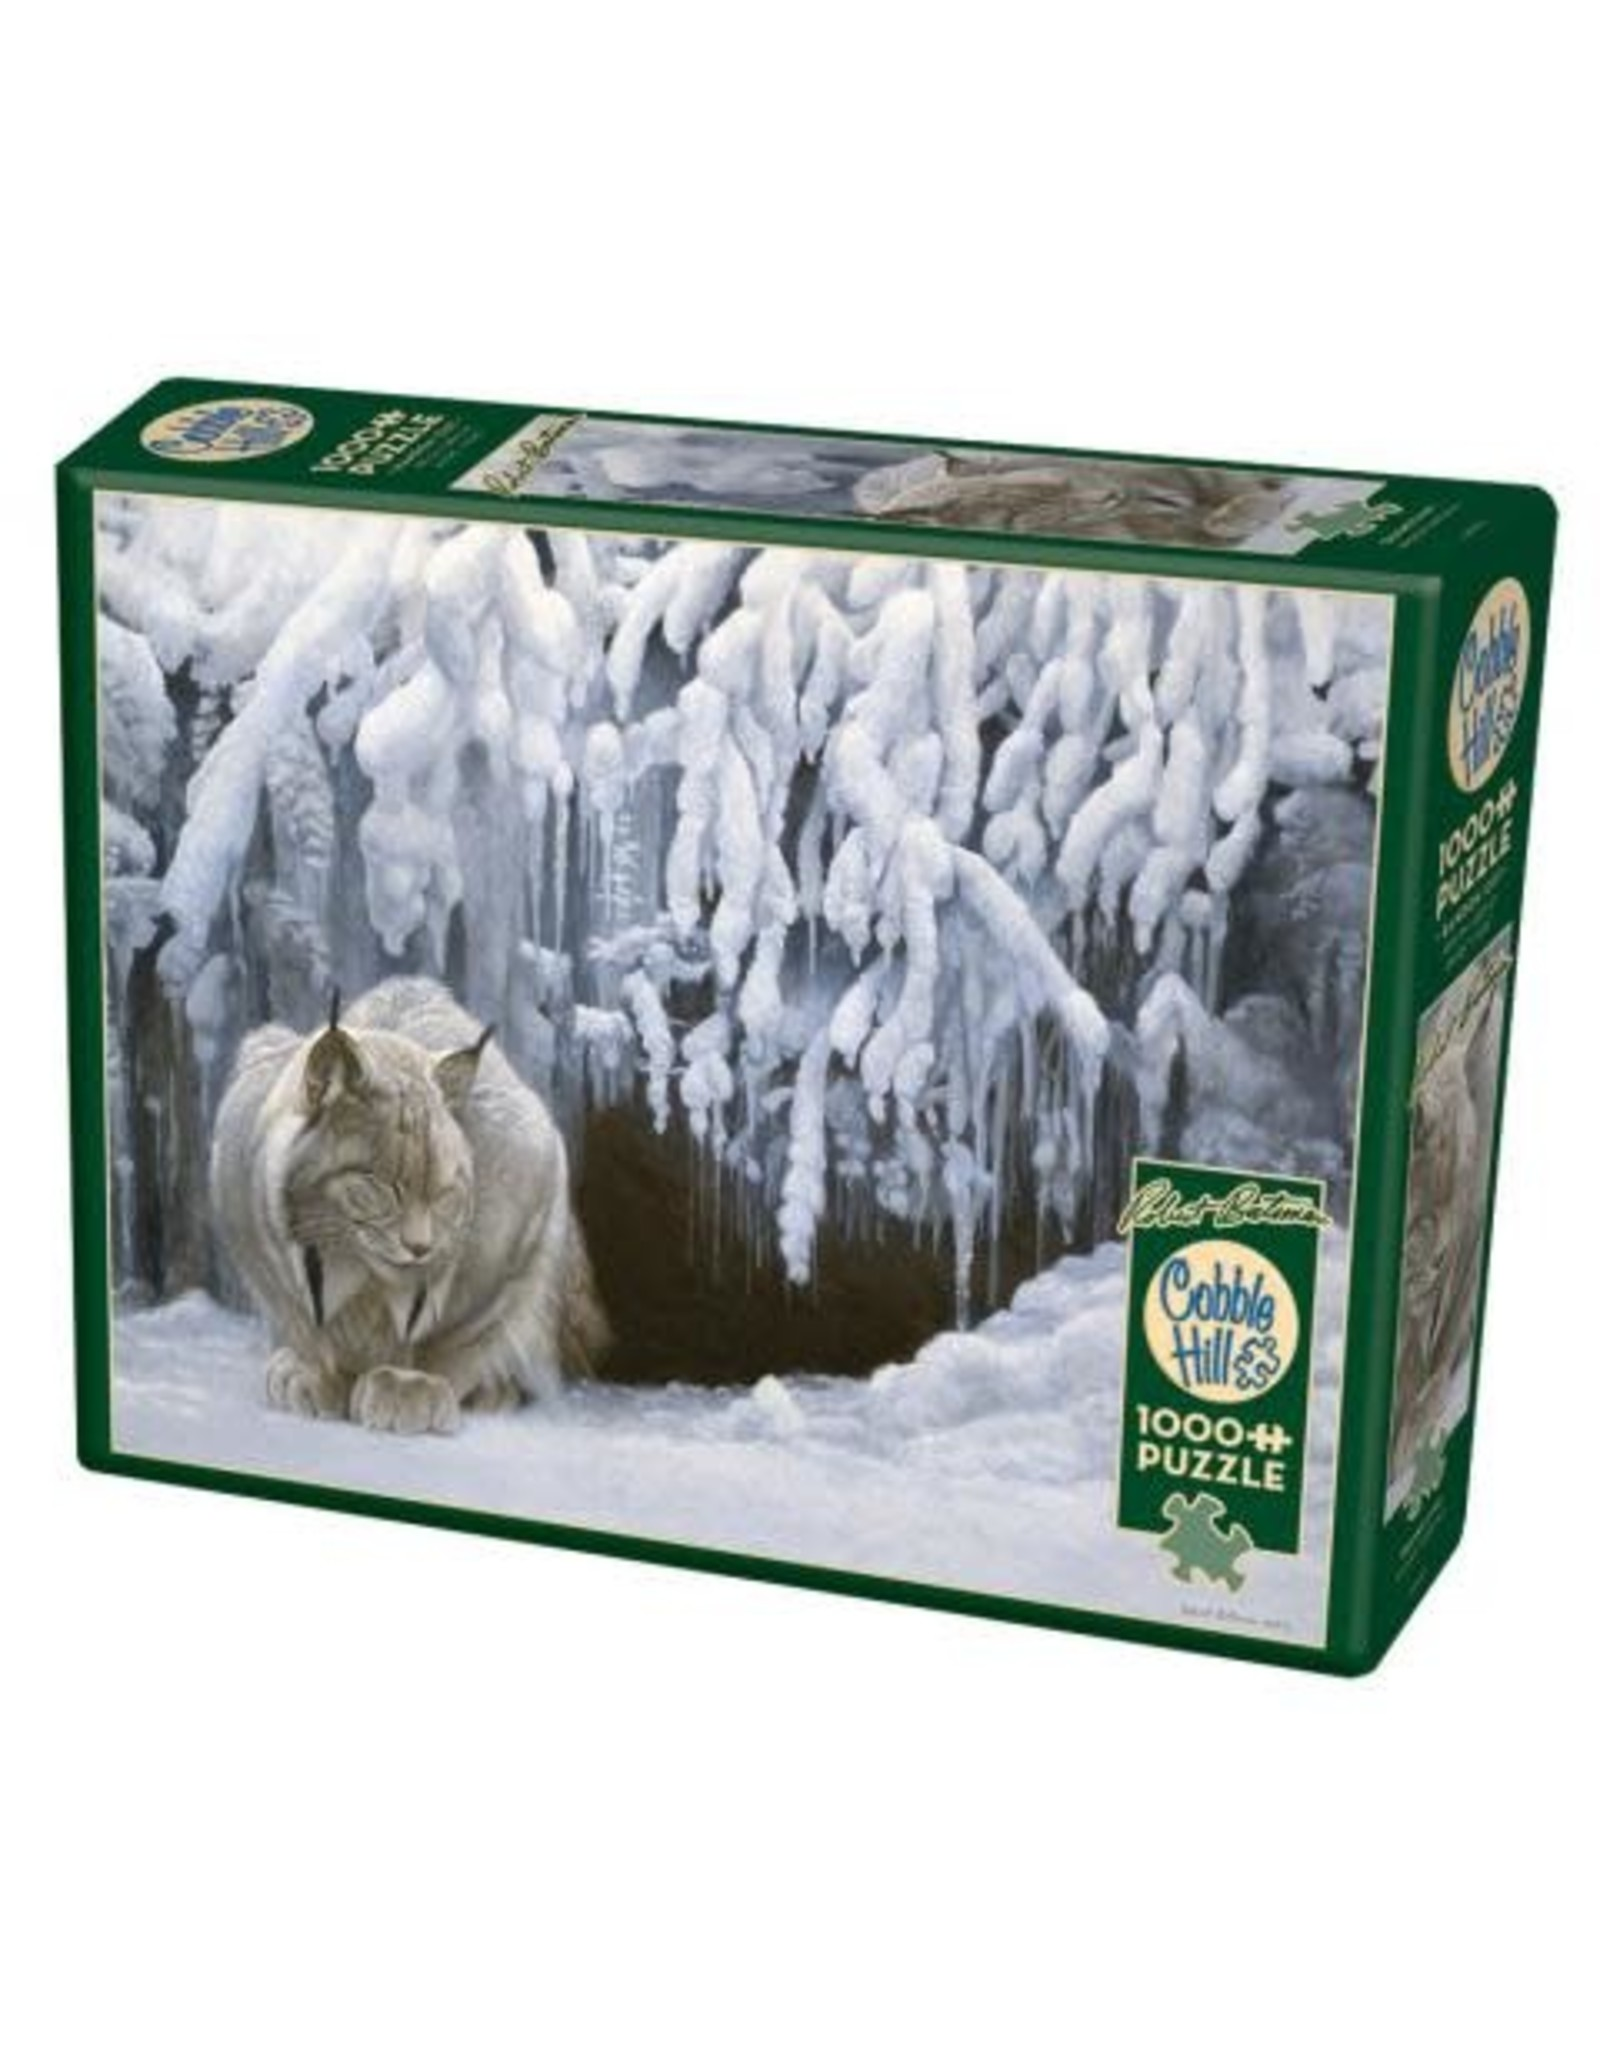 Cobble Hill Puzzles OM80123 Cobblehill Puzzle 1000pc Dozing Lynx